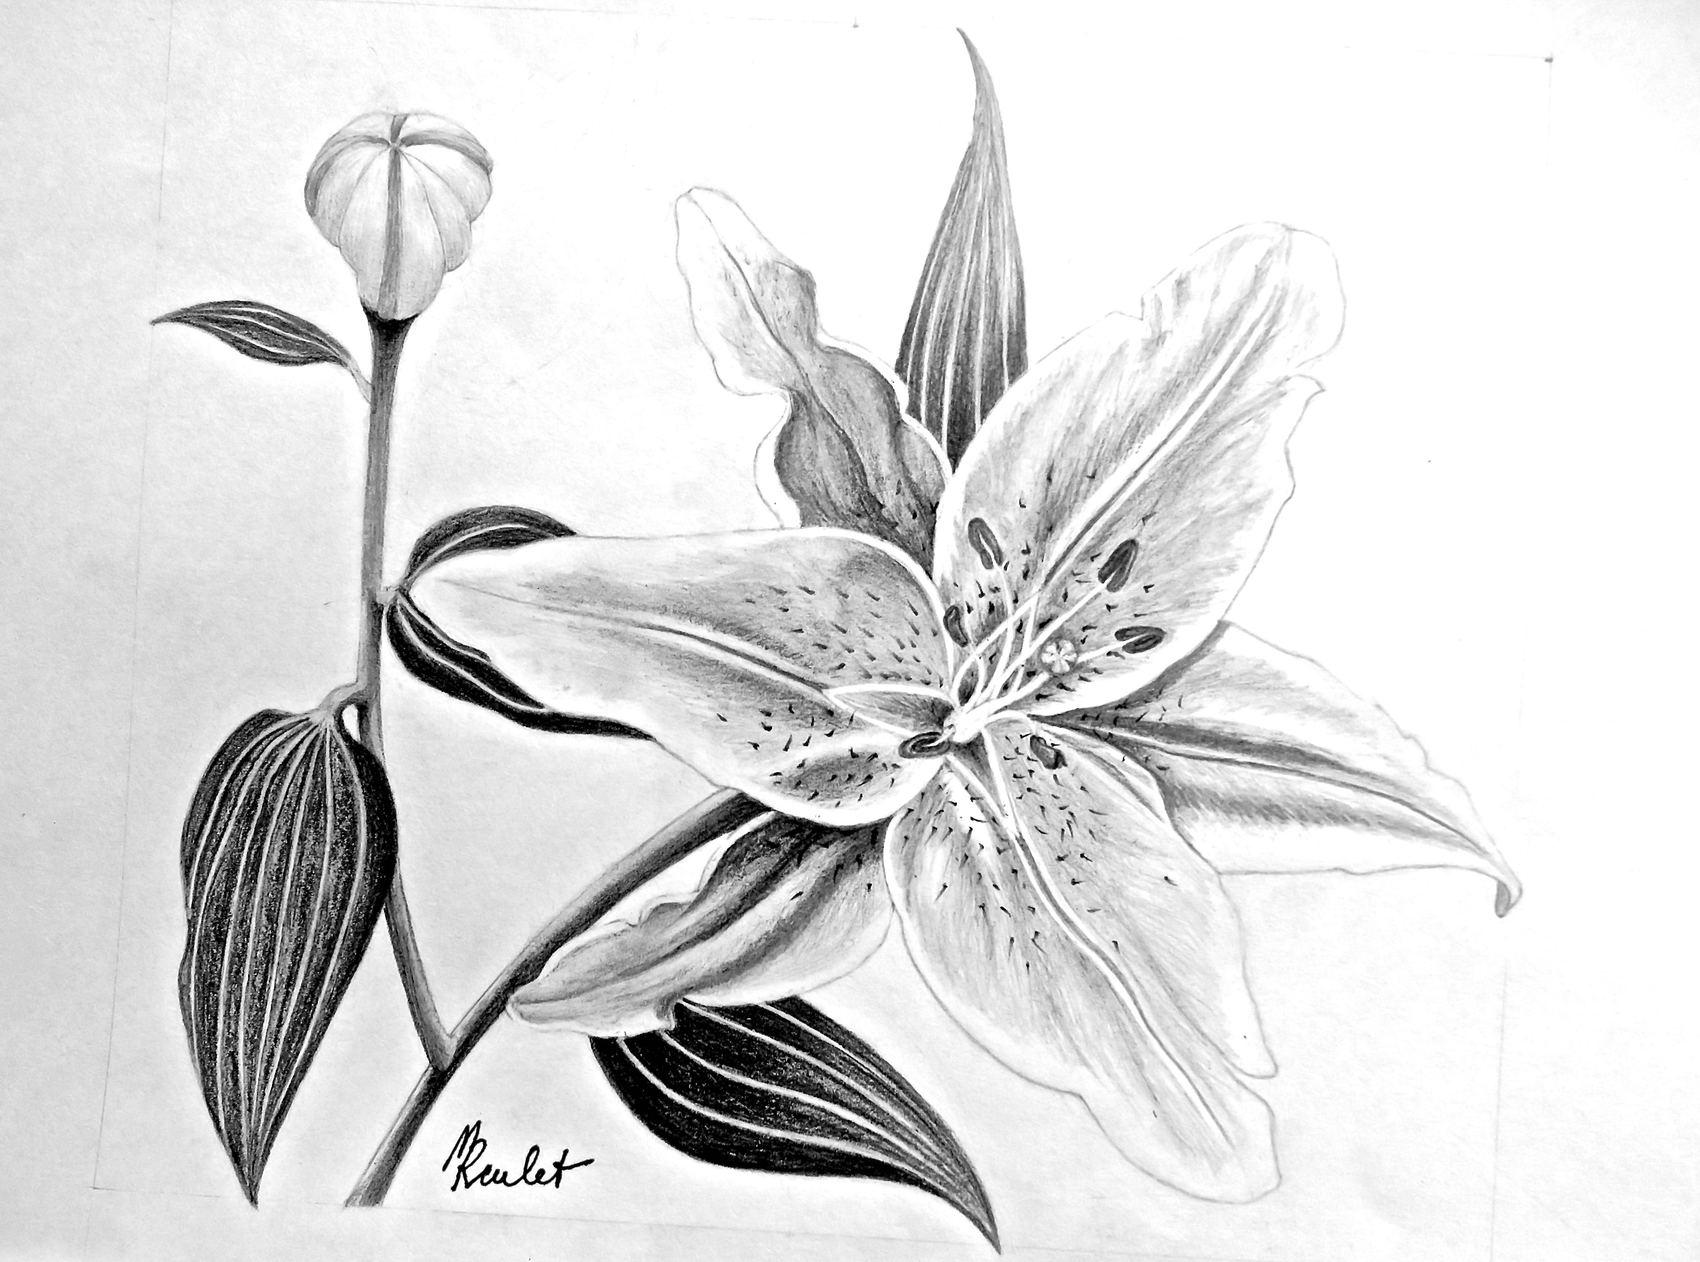 Dessin le lys rose en fleur 1 2 drawing a pink lily flower 1 2 - Fleur en dessin ...